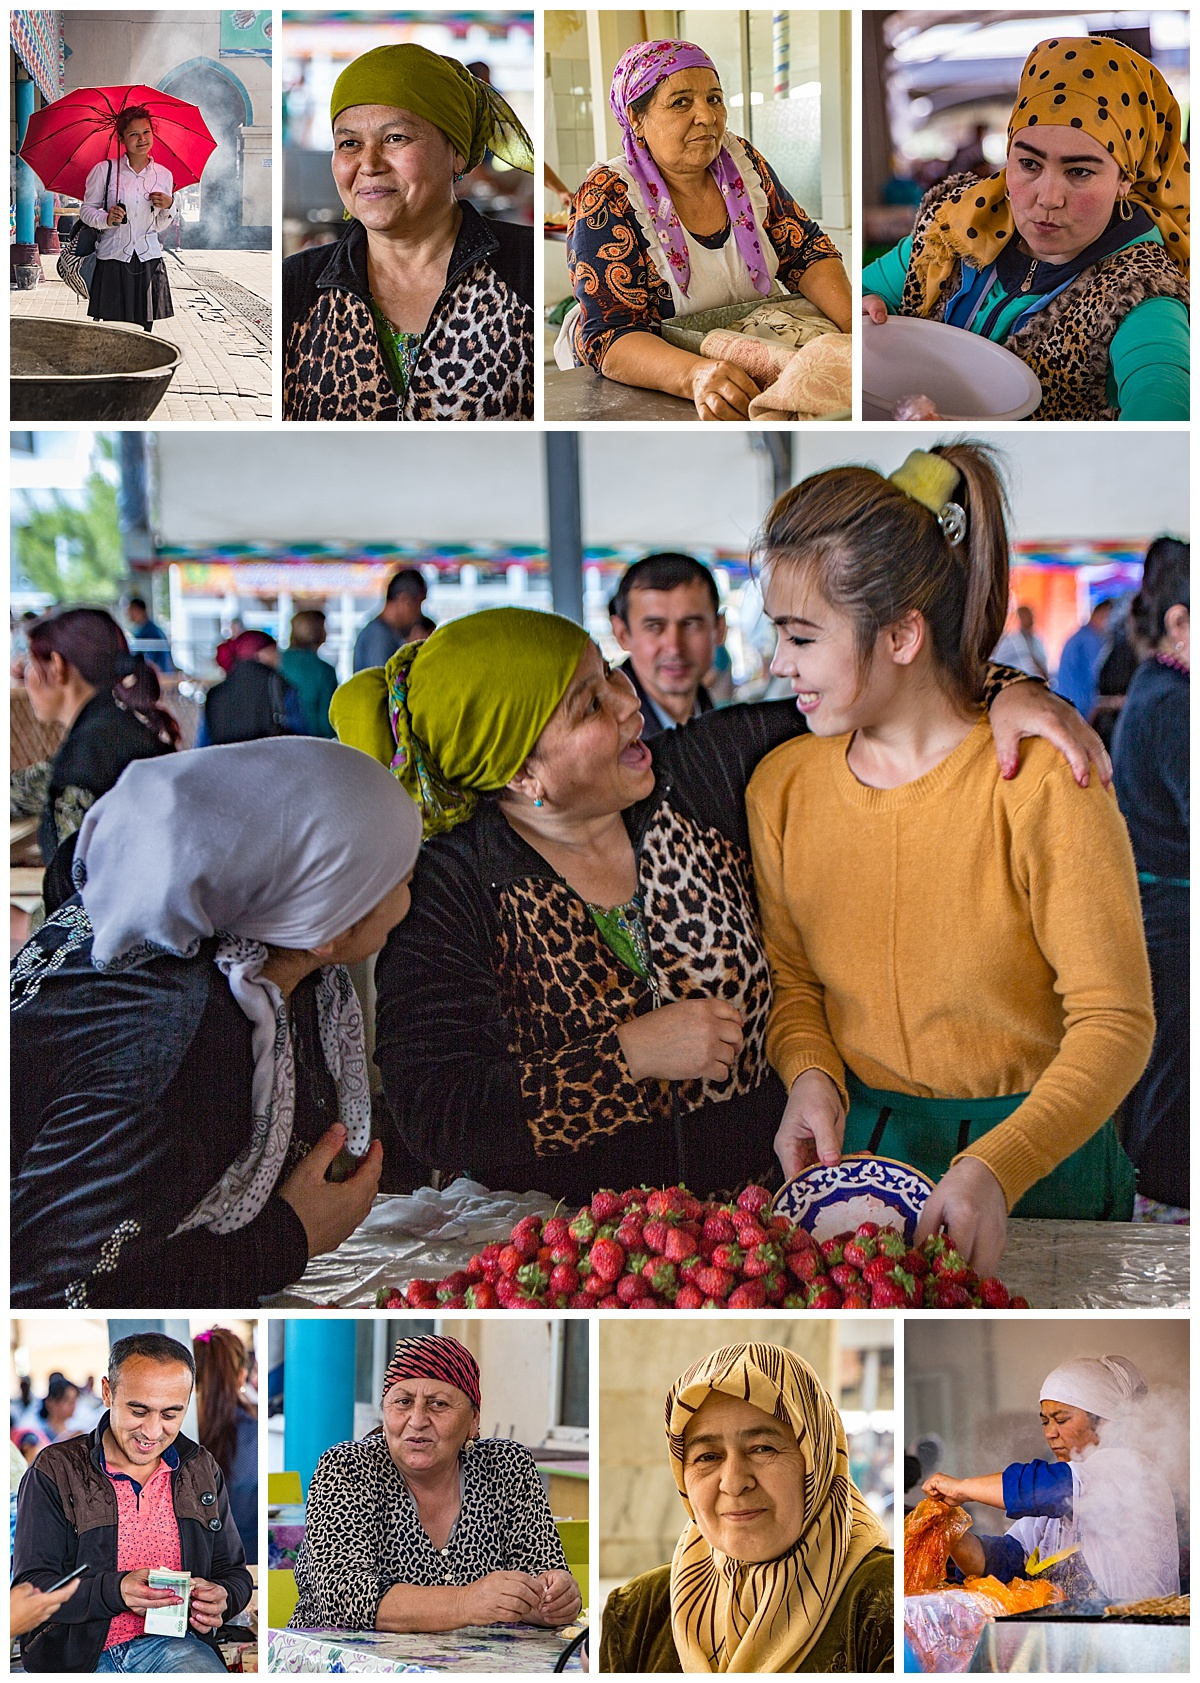 Tashkent, Uzbekistan - people 2